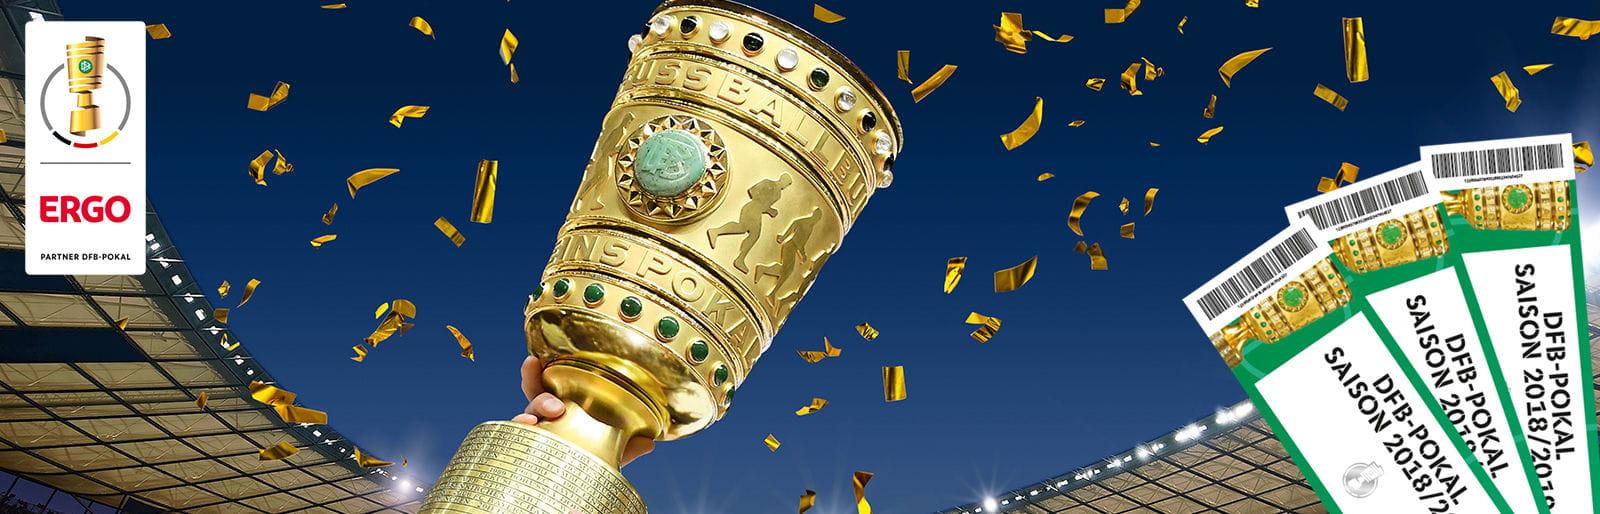 VERLOSUNG DFB POKAL 2019